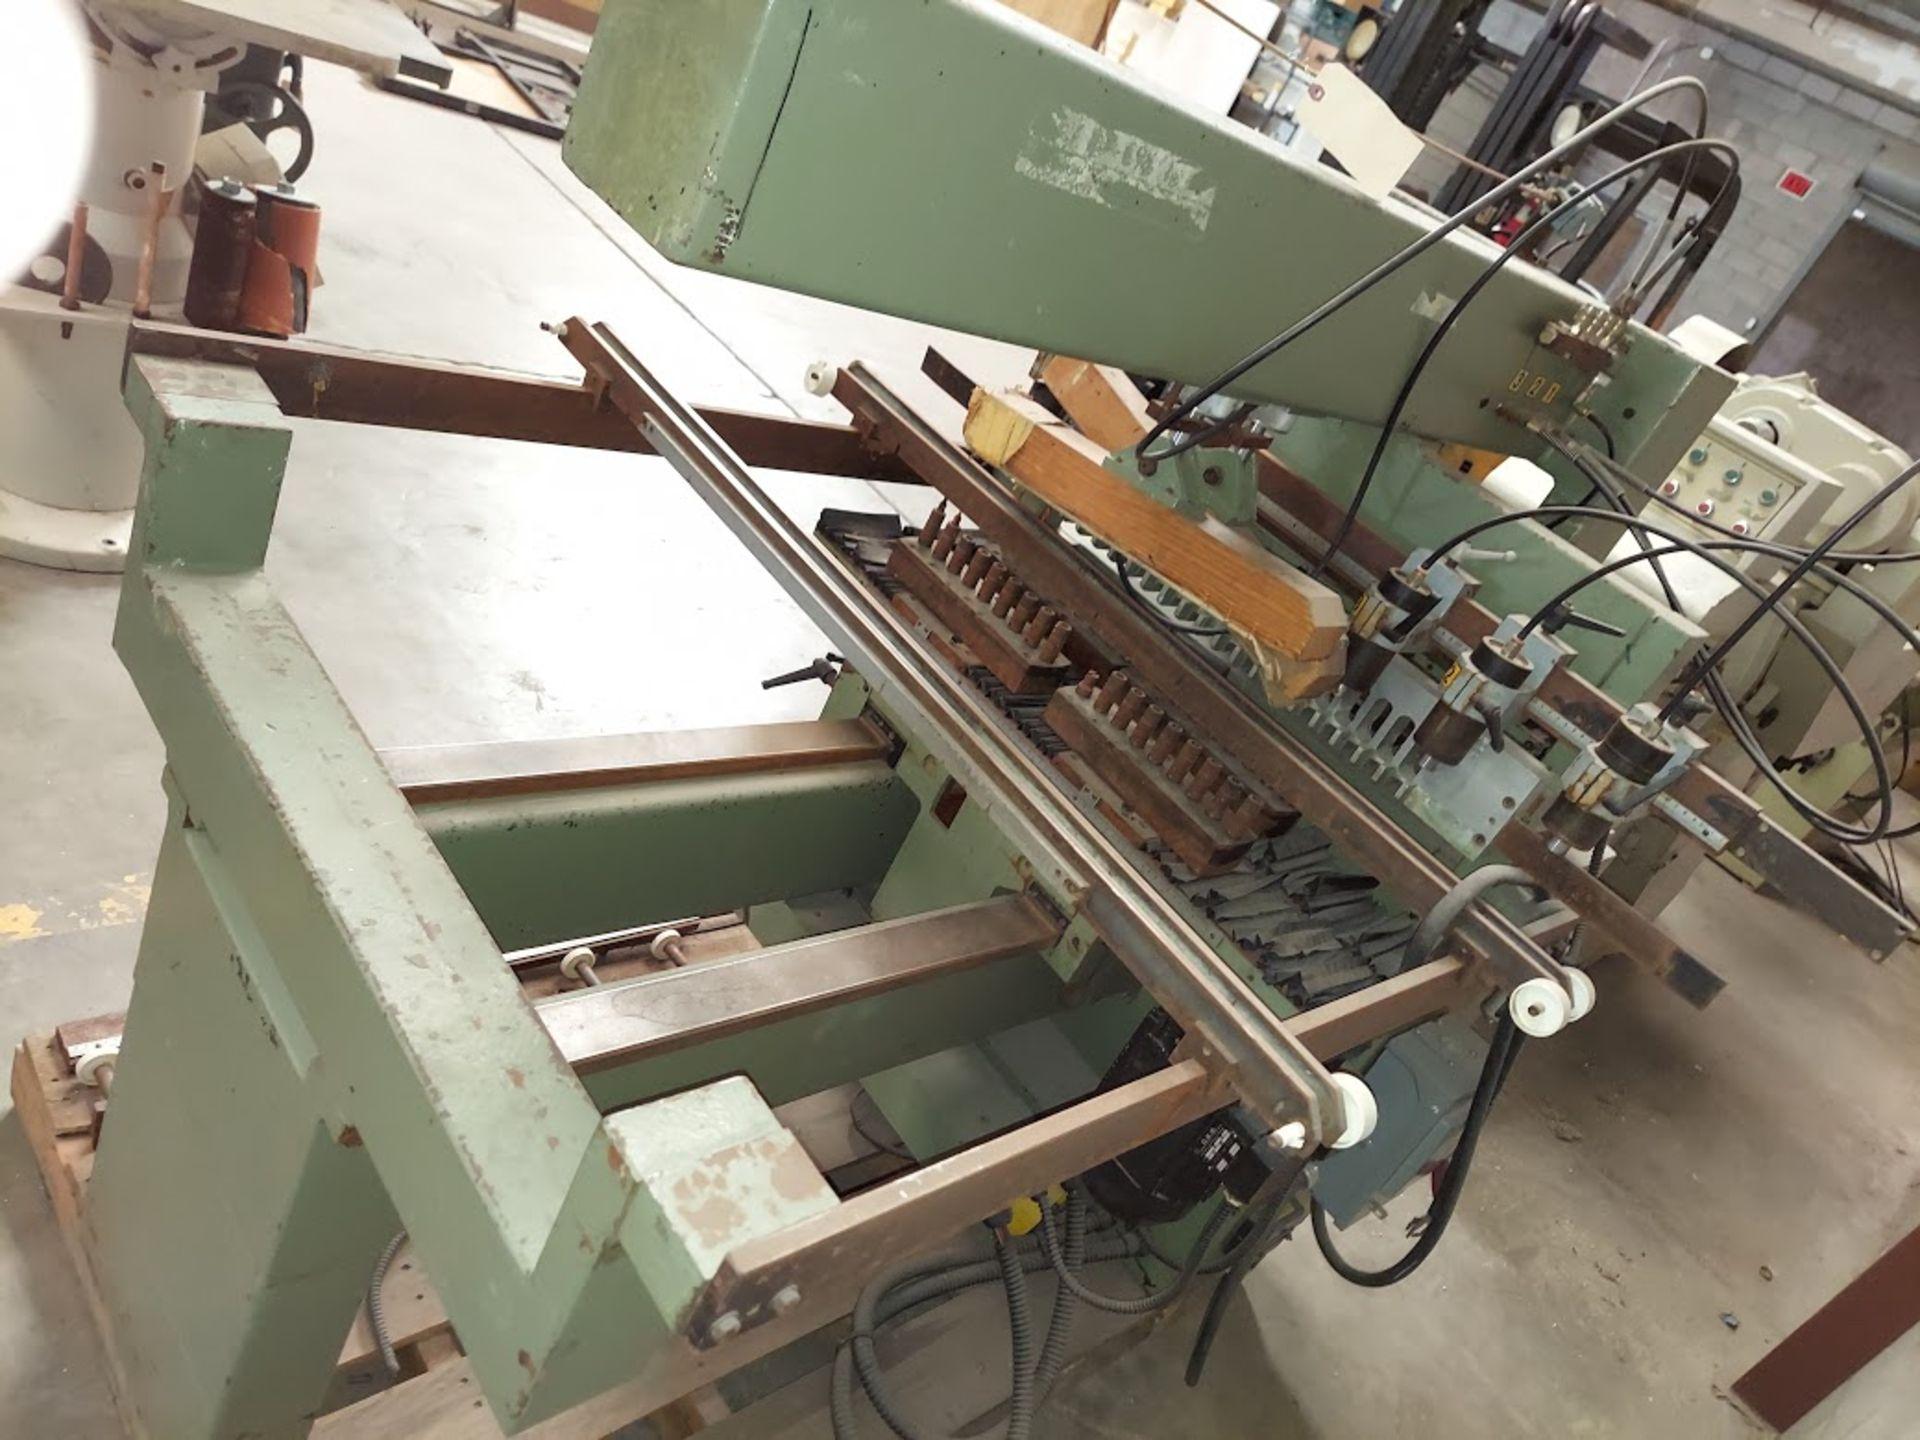 Zangheri & Boschetti Mulit Mat P3 Line Boring Machine, Model #MP3, 1 - 21 Spindle Horizontal Drill - Image 6 of 7